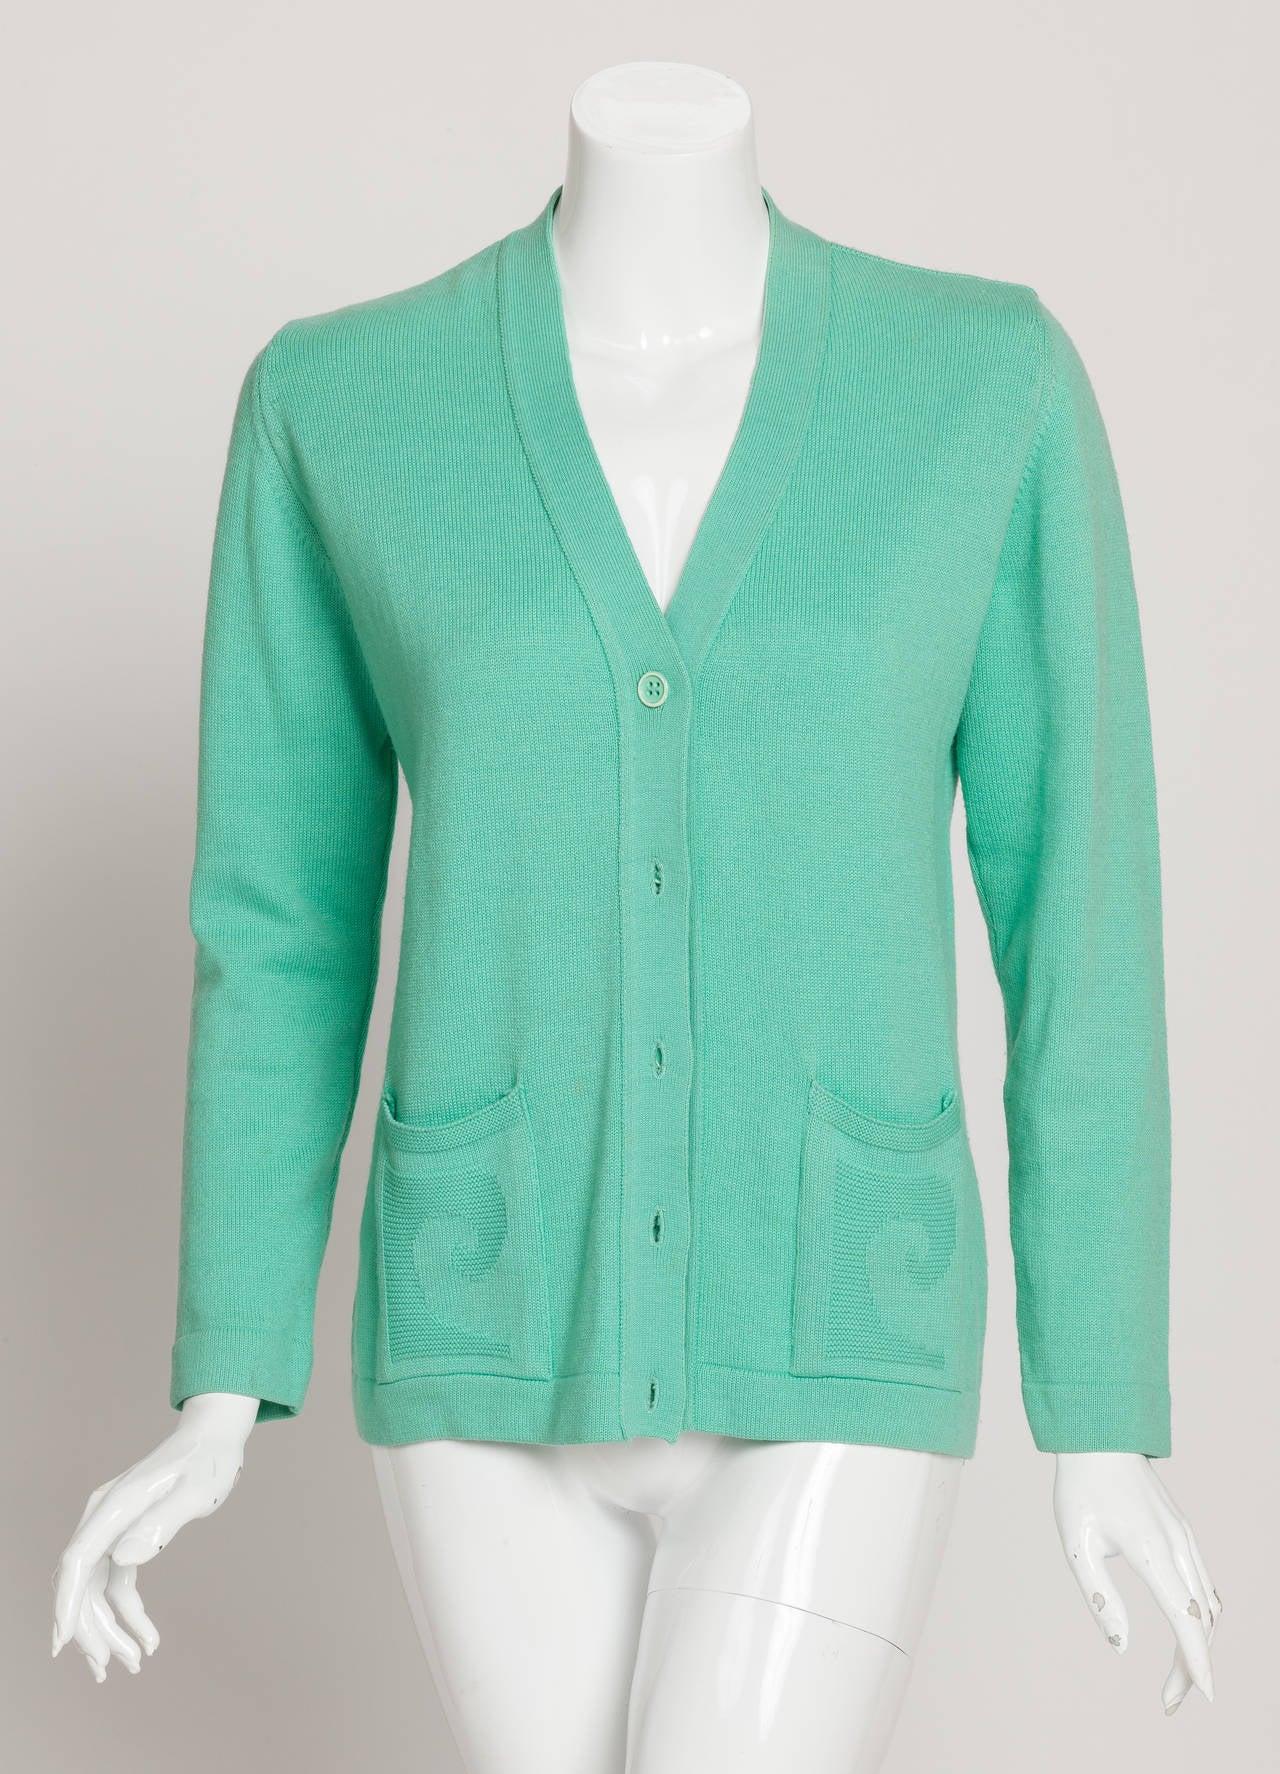 Vintage Pierre Cardin Aqua Green Cardigan w/Logo at Pockets 2